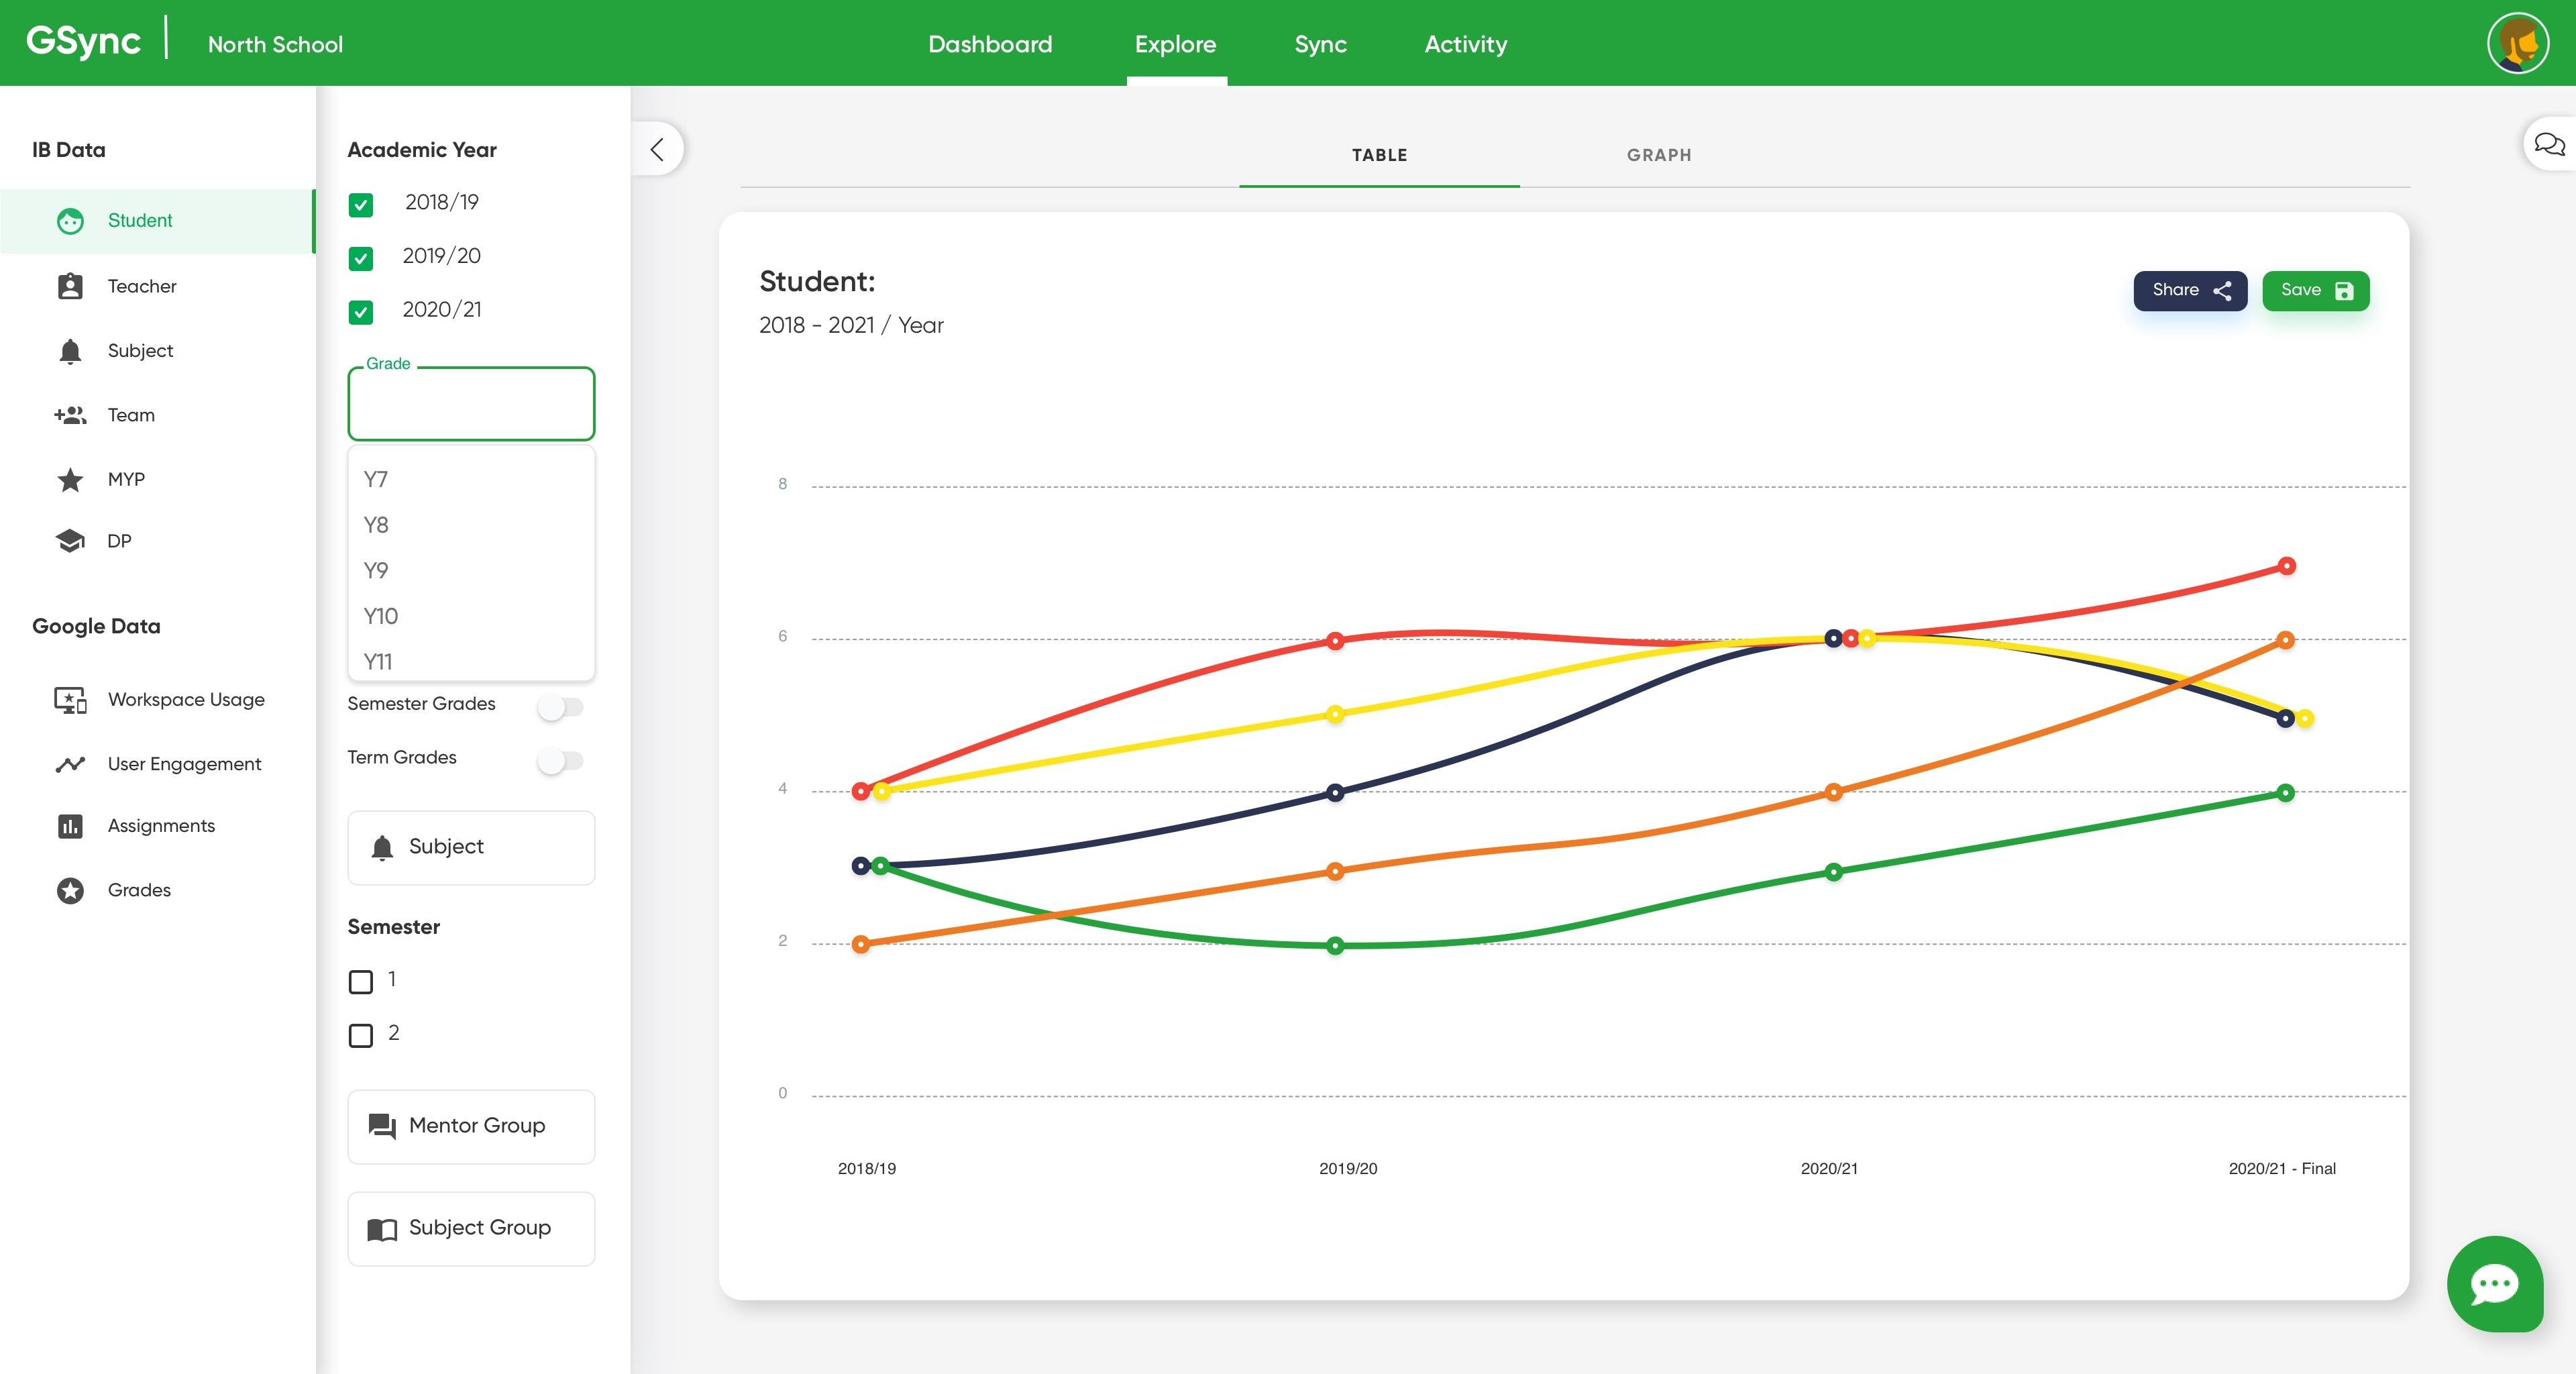 GSync Explorer Web App Explore View